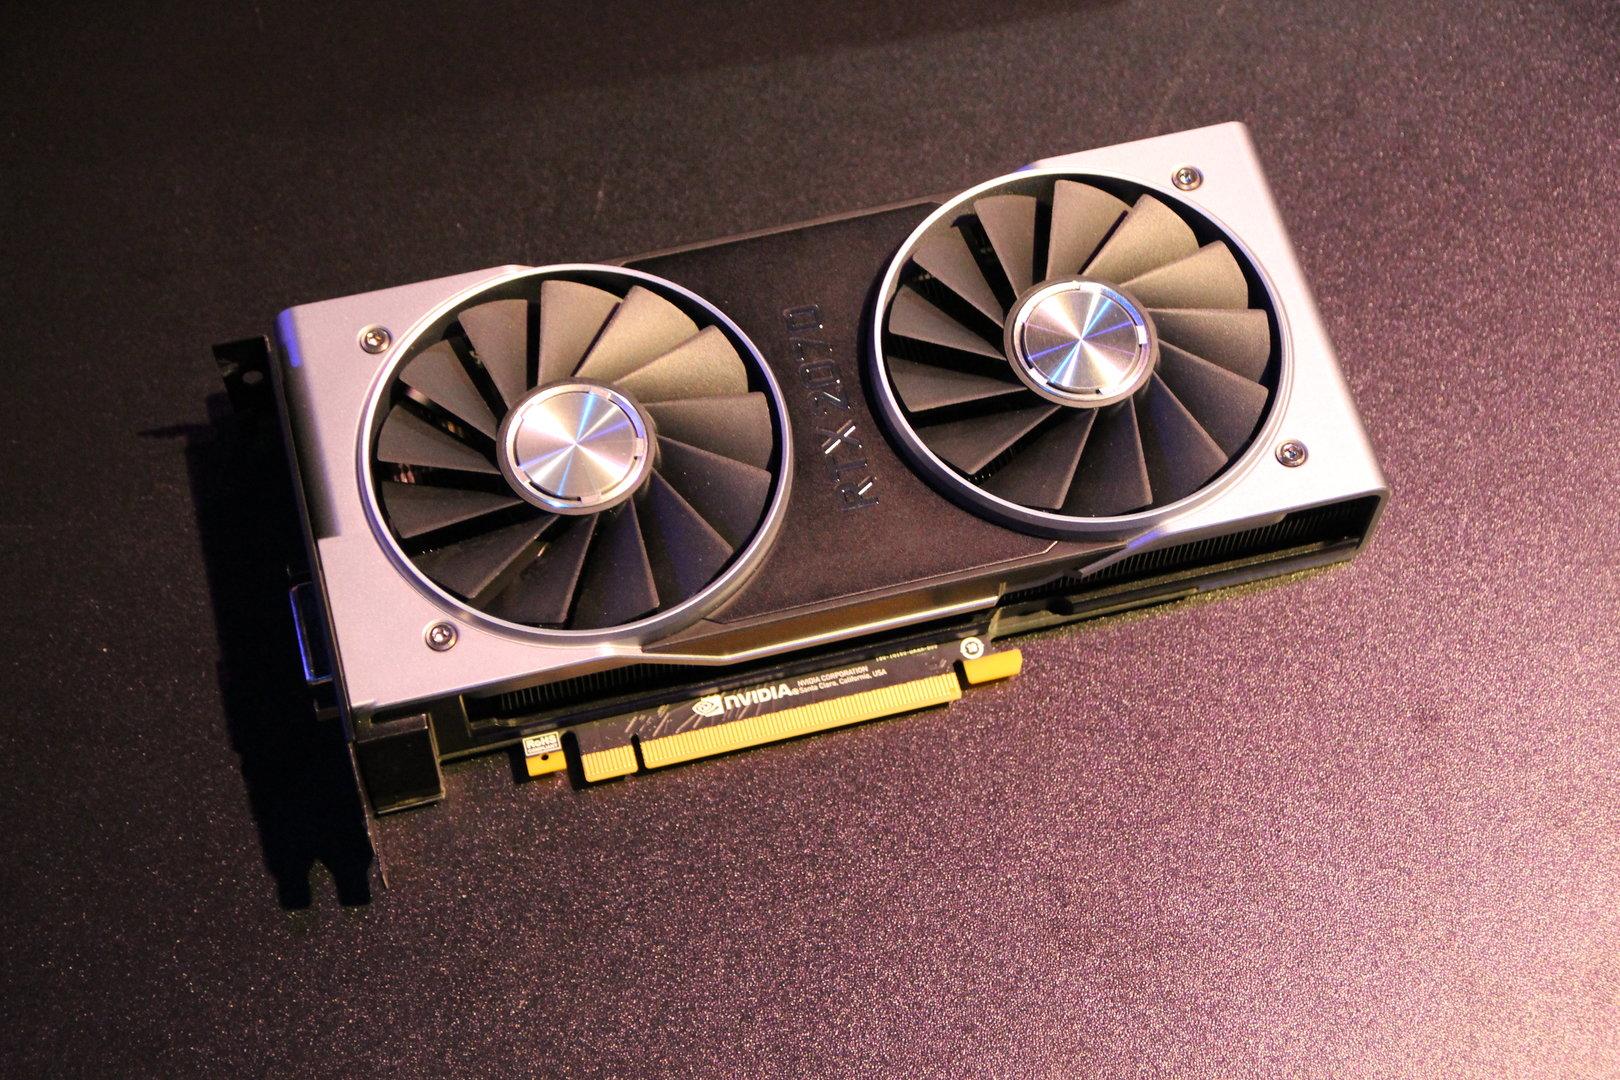 GeForce RTX 2080 Ti, 2080 & 2070: Technik im Detail